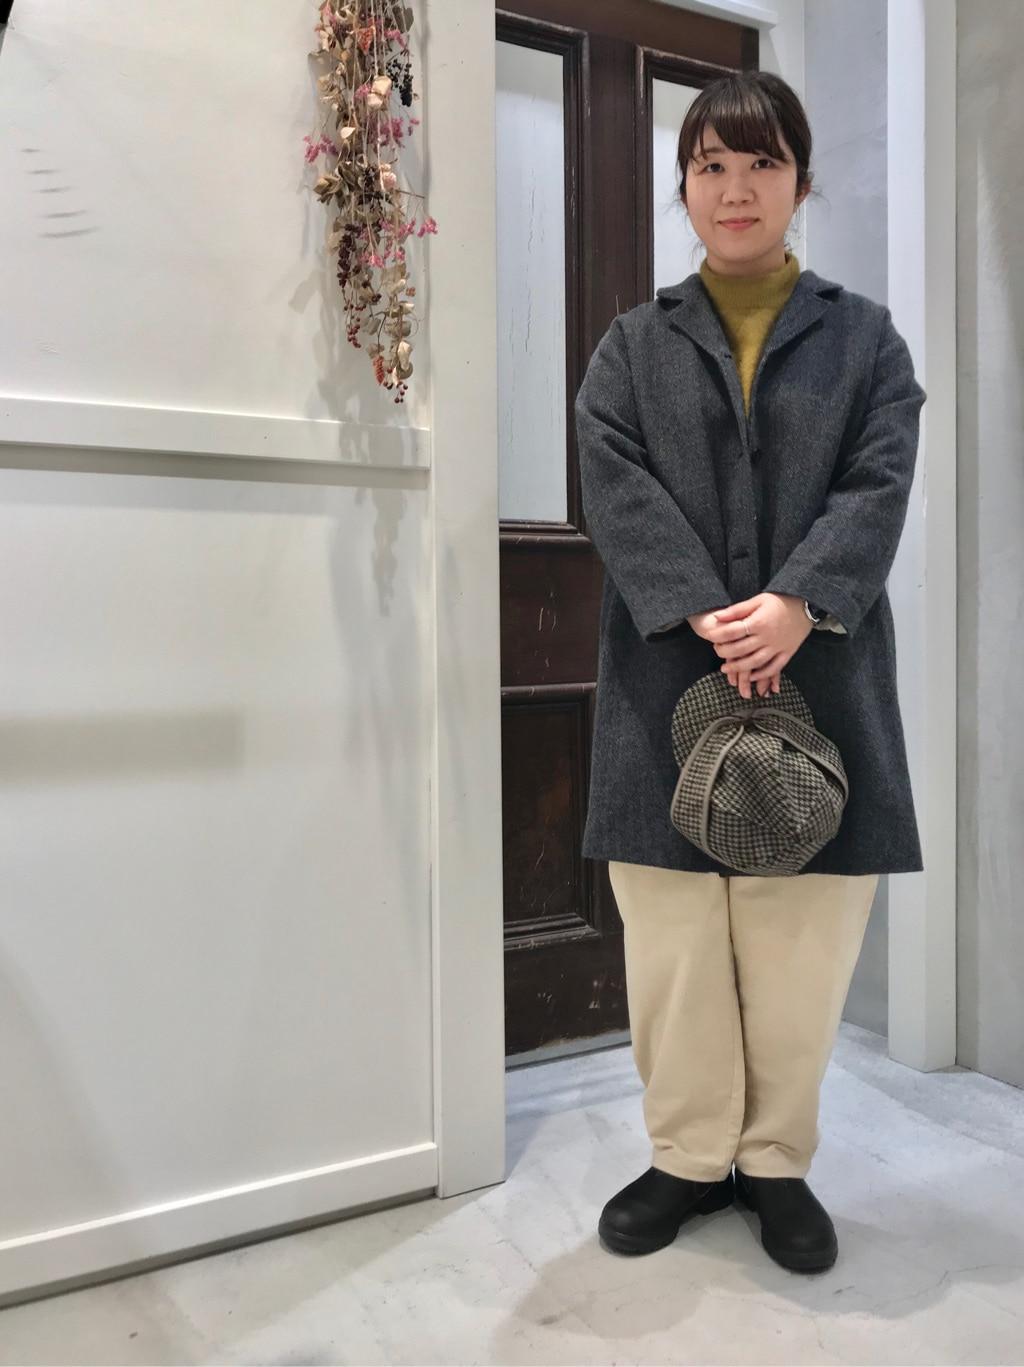 chambre de charme キラリナ京王吉祥寺 身長:155cm 2020.11.11